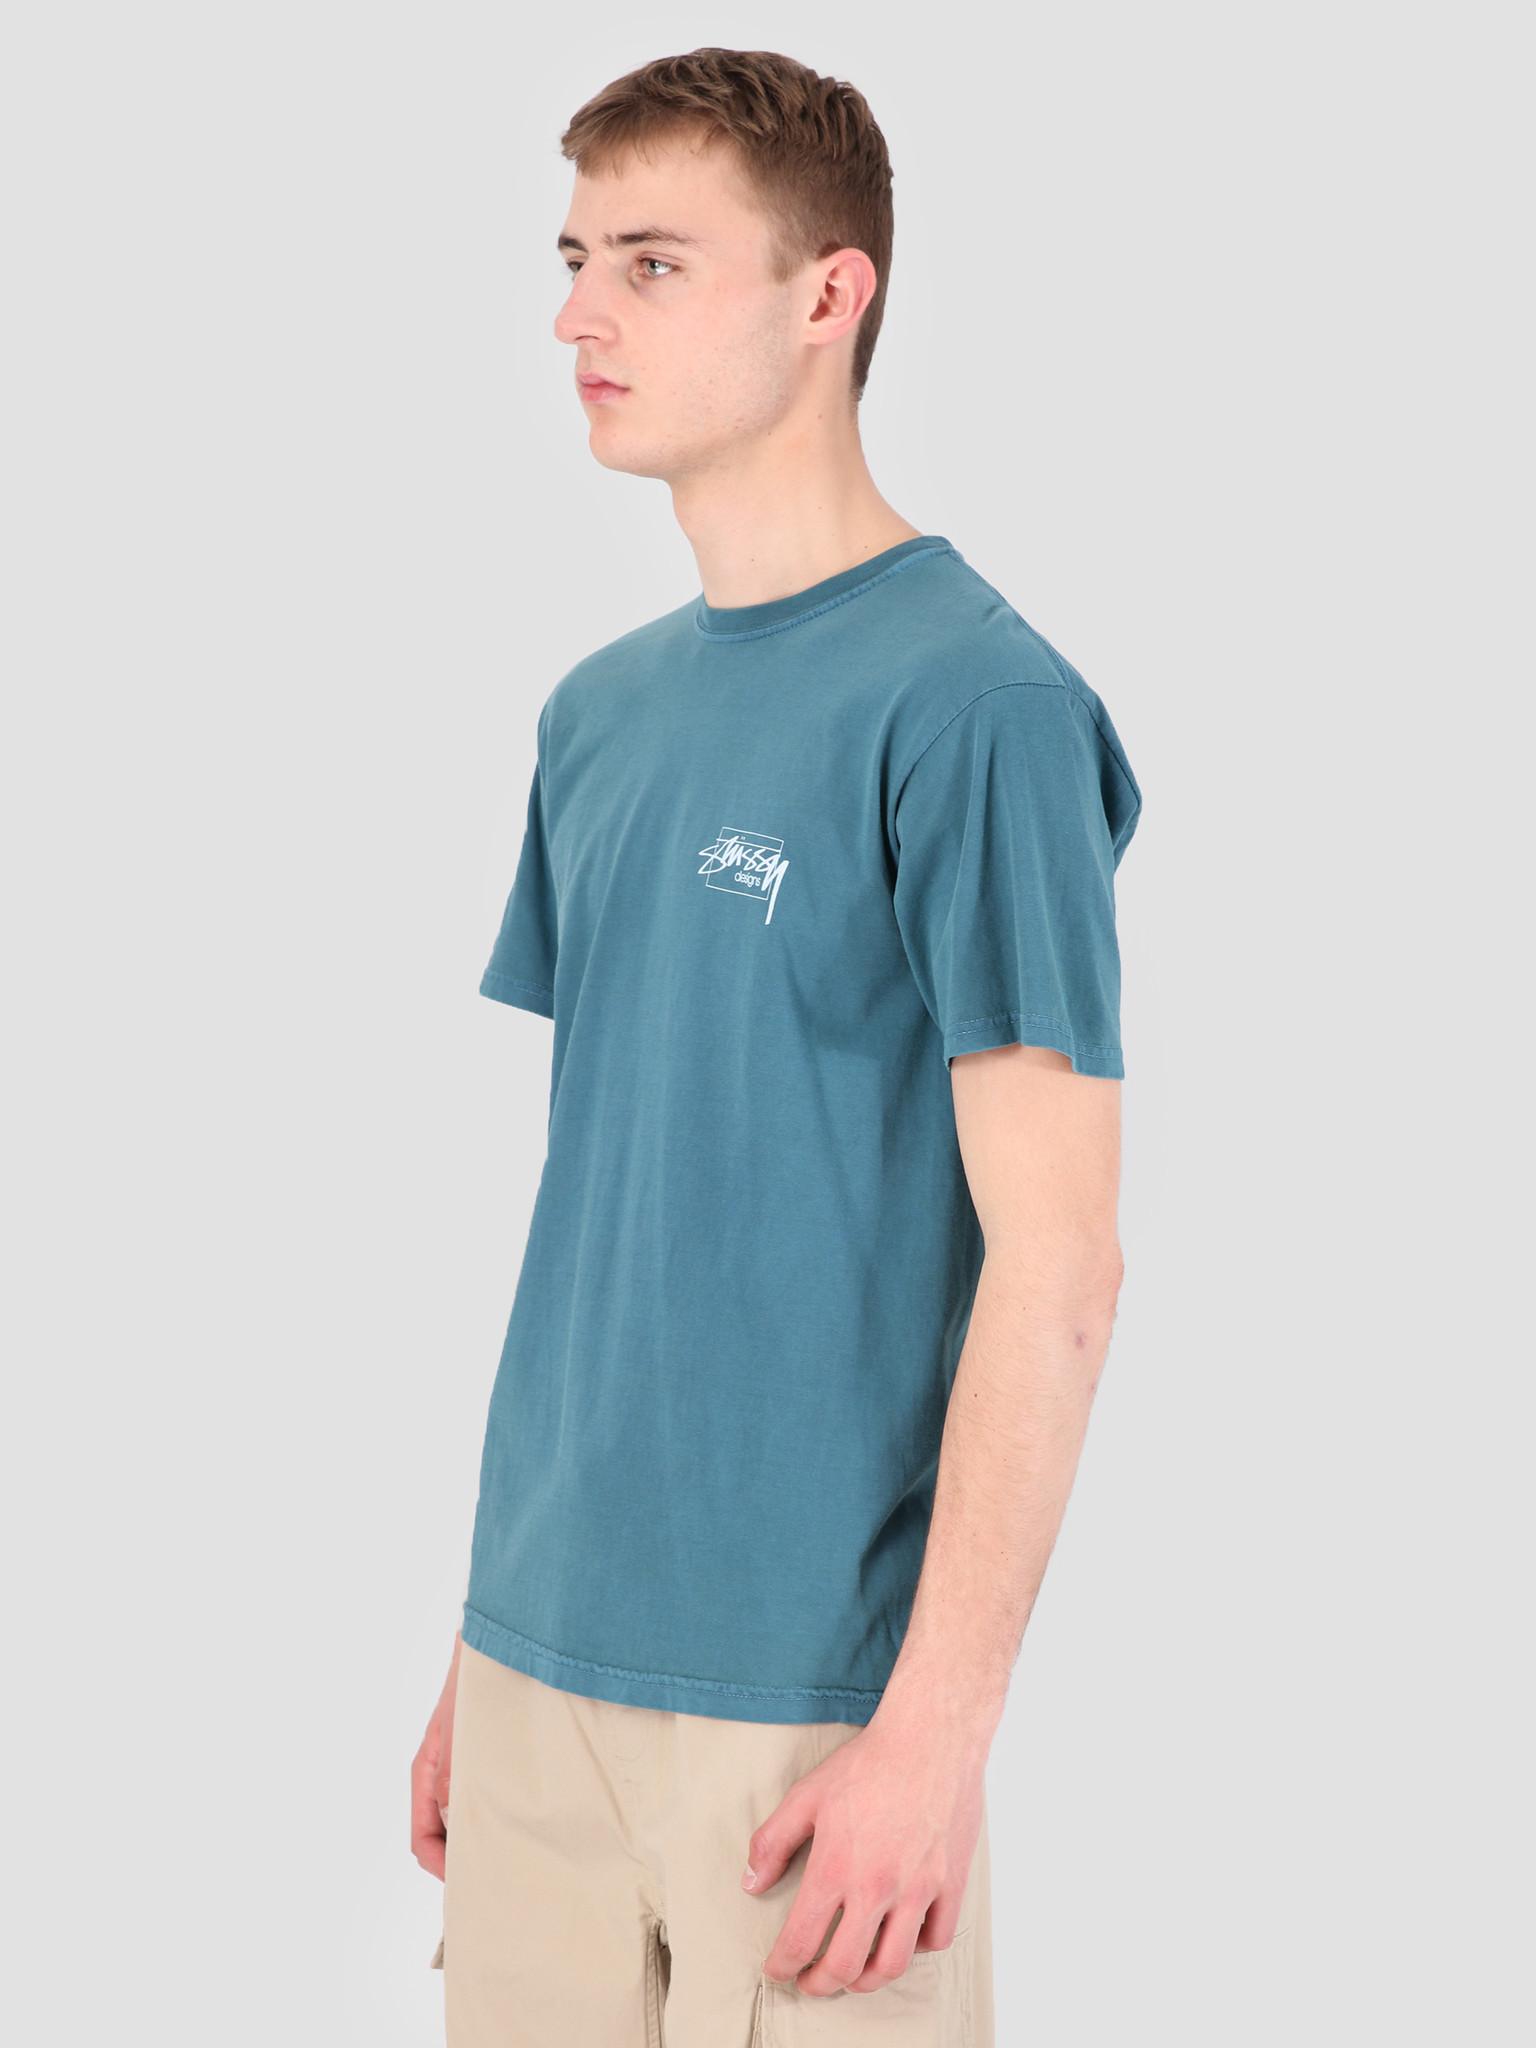 Stussy Stussy Modern Age Pig. Dyed T-Shirt Slate 0007